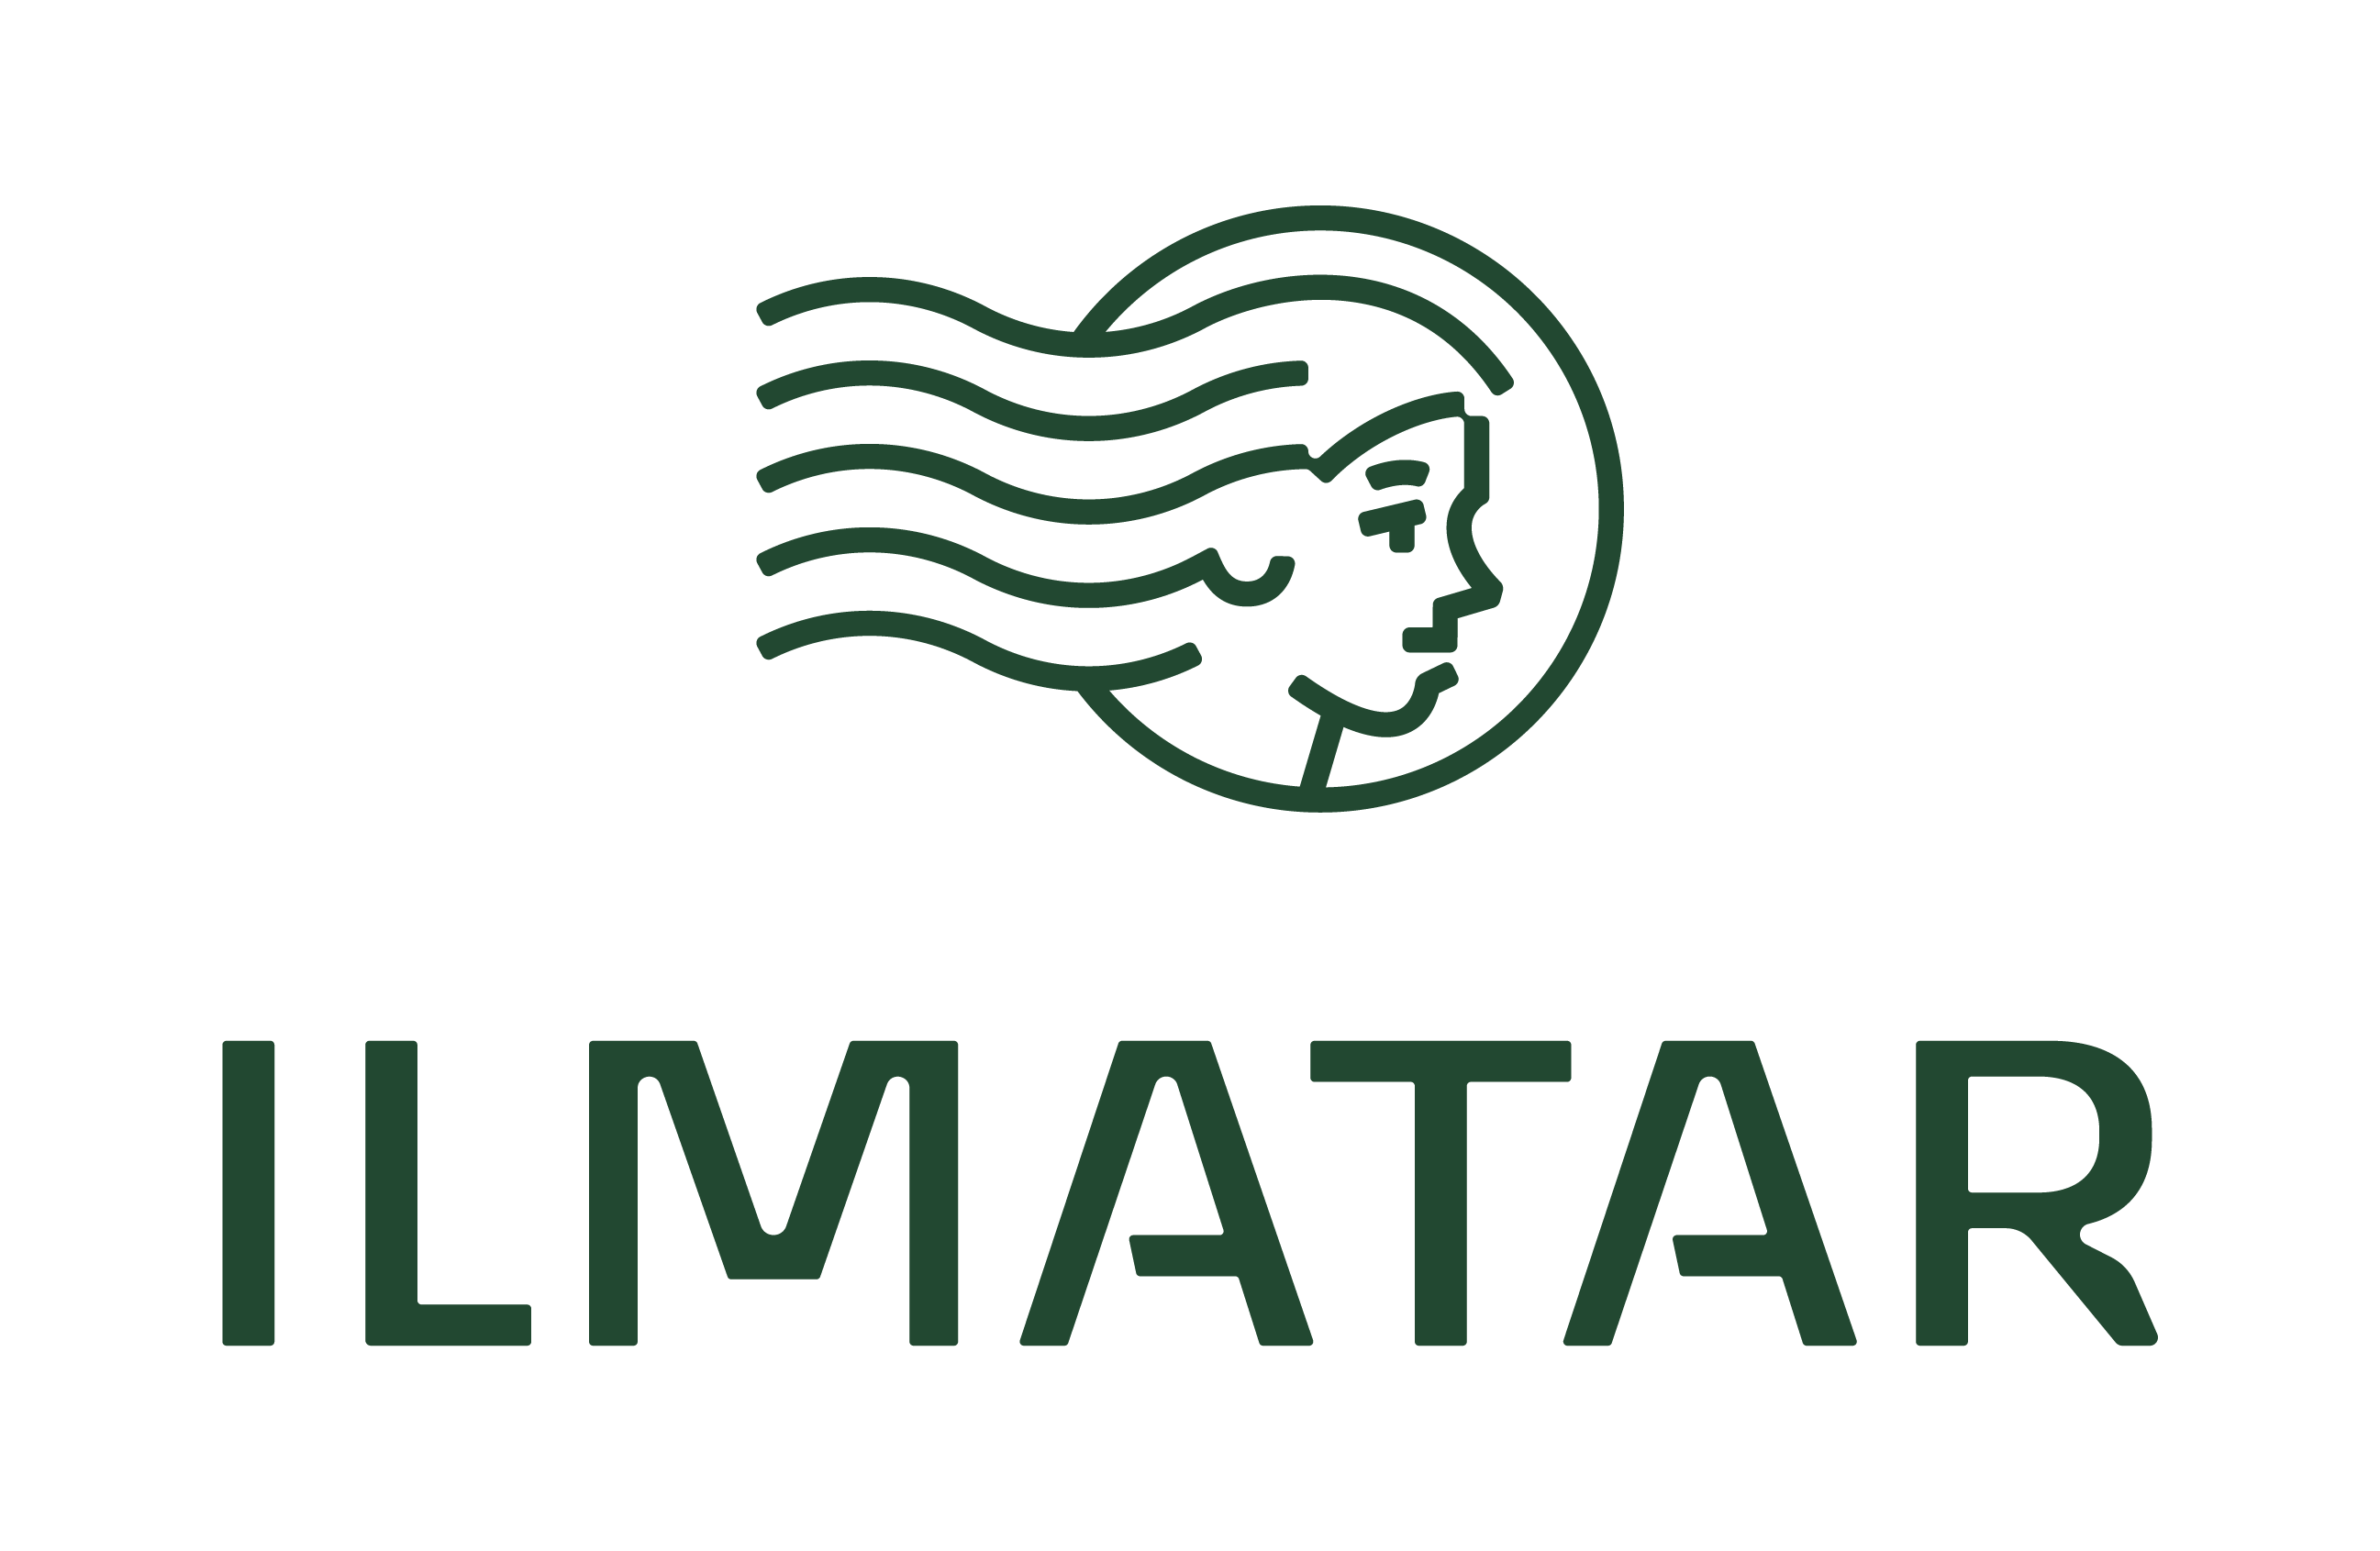 ilmatar_logo-emblem-dark_green.png (68 KB)